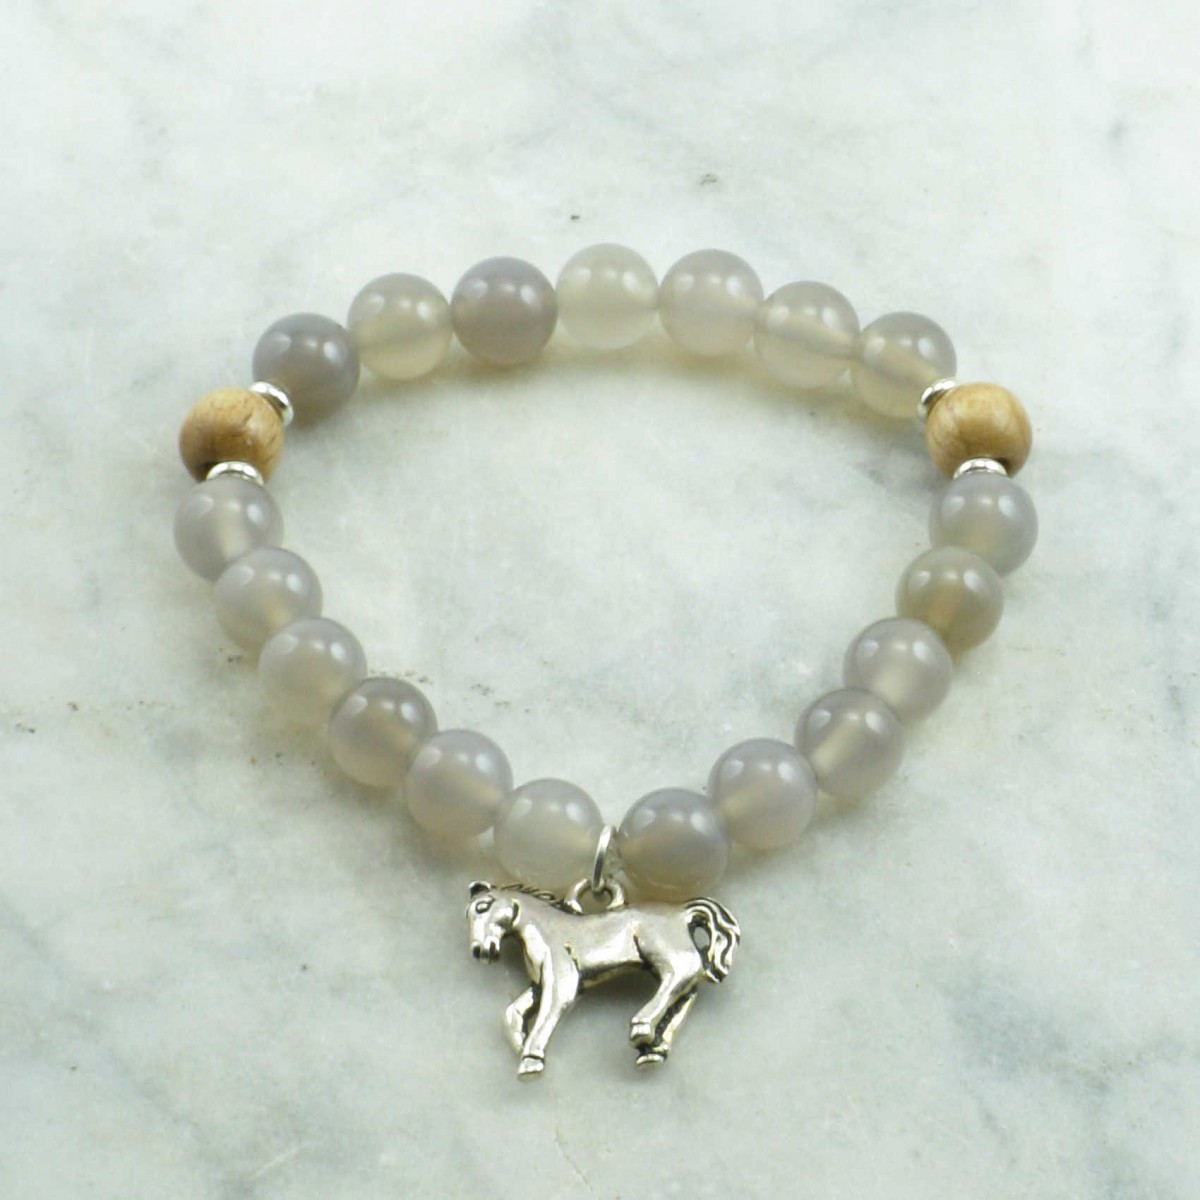 Wind_Horse_Mala_Bracelet_21_Grey_Agate_Mala_Beads_Buddhist_Bracelet